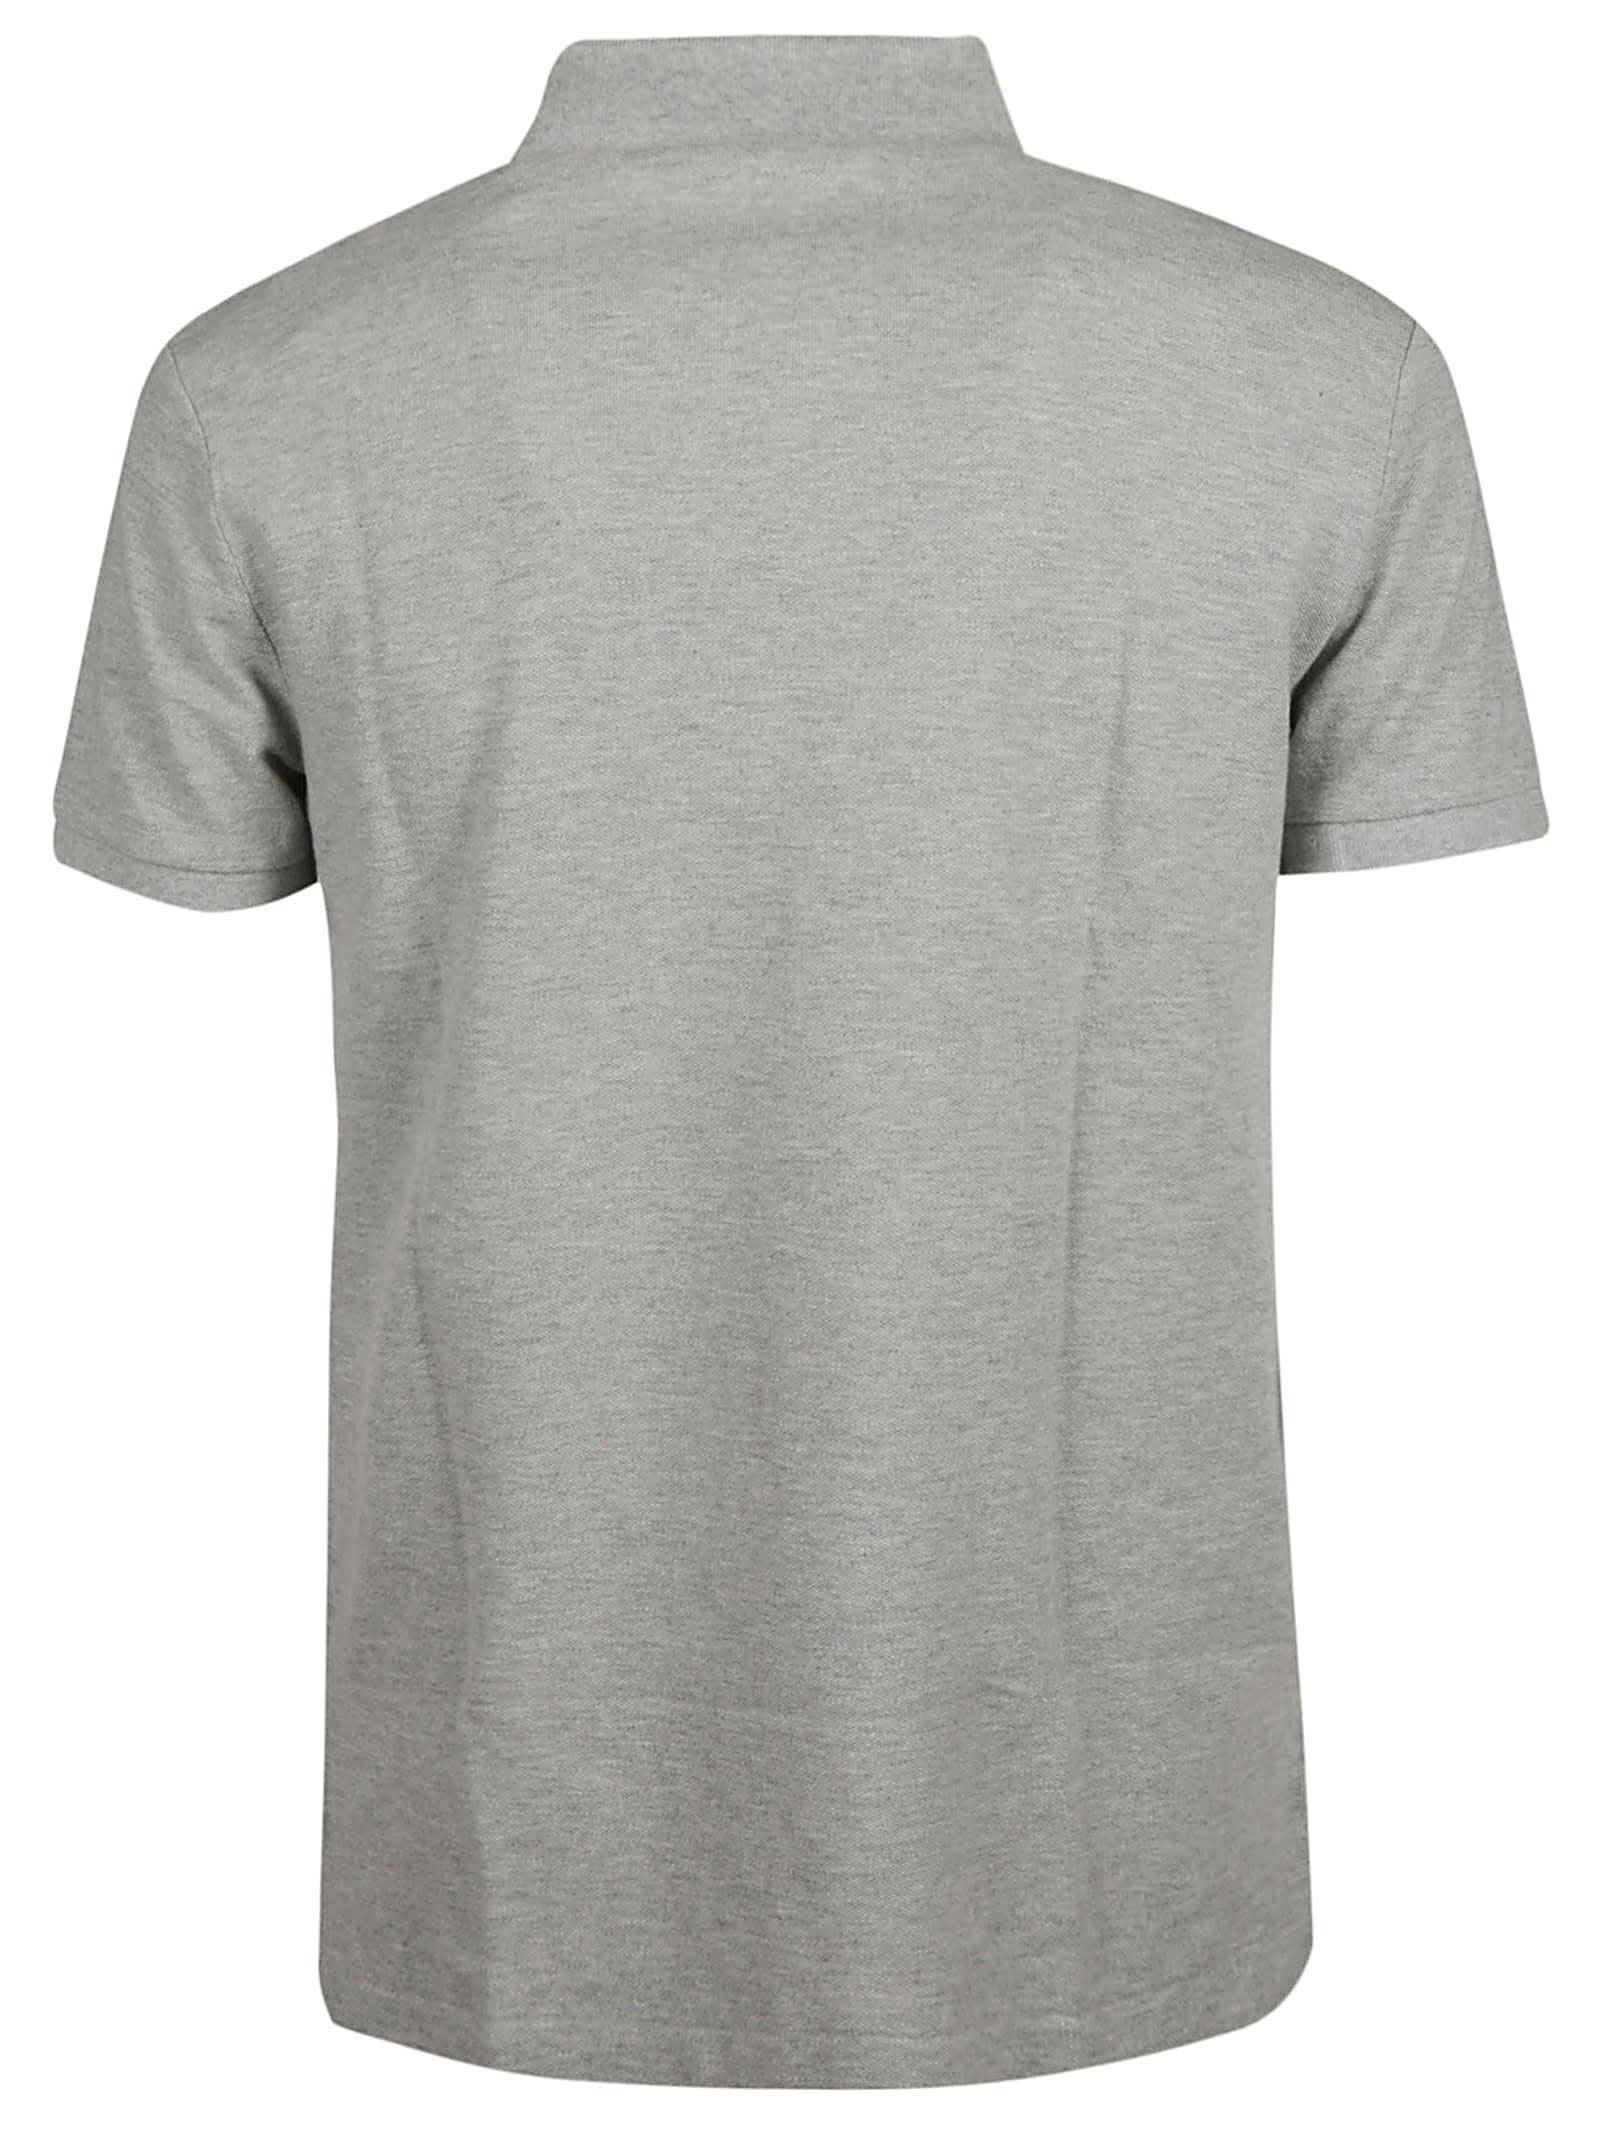 Lauren Bear Print Ralph Shirt Polo eI9YEDWH2b